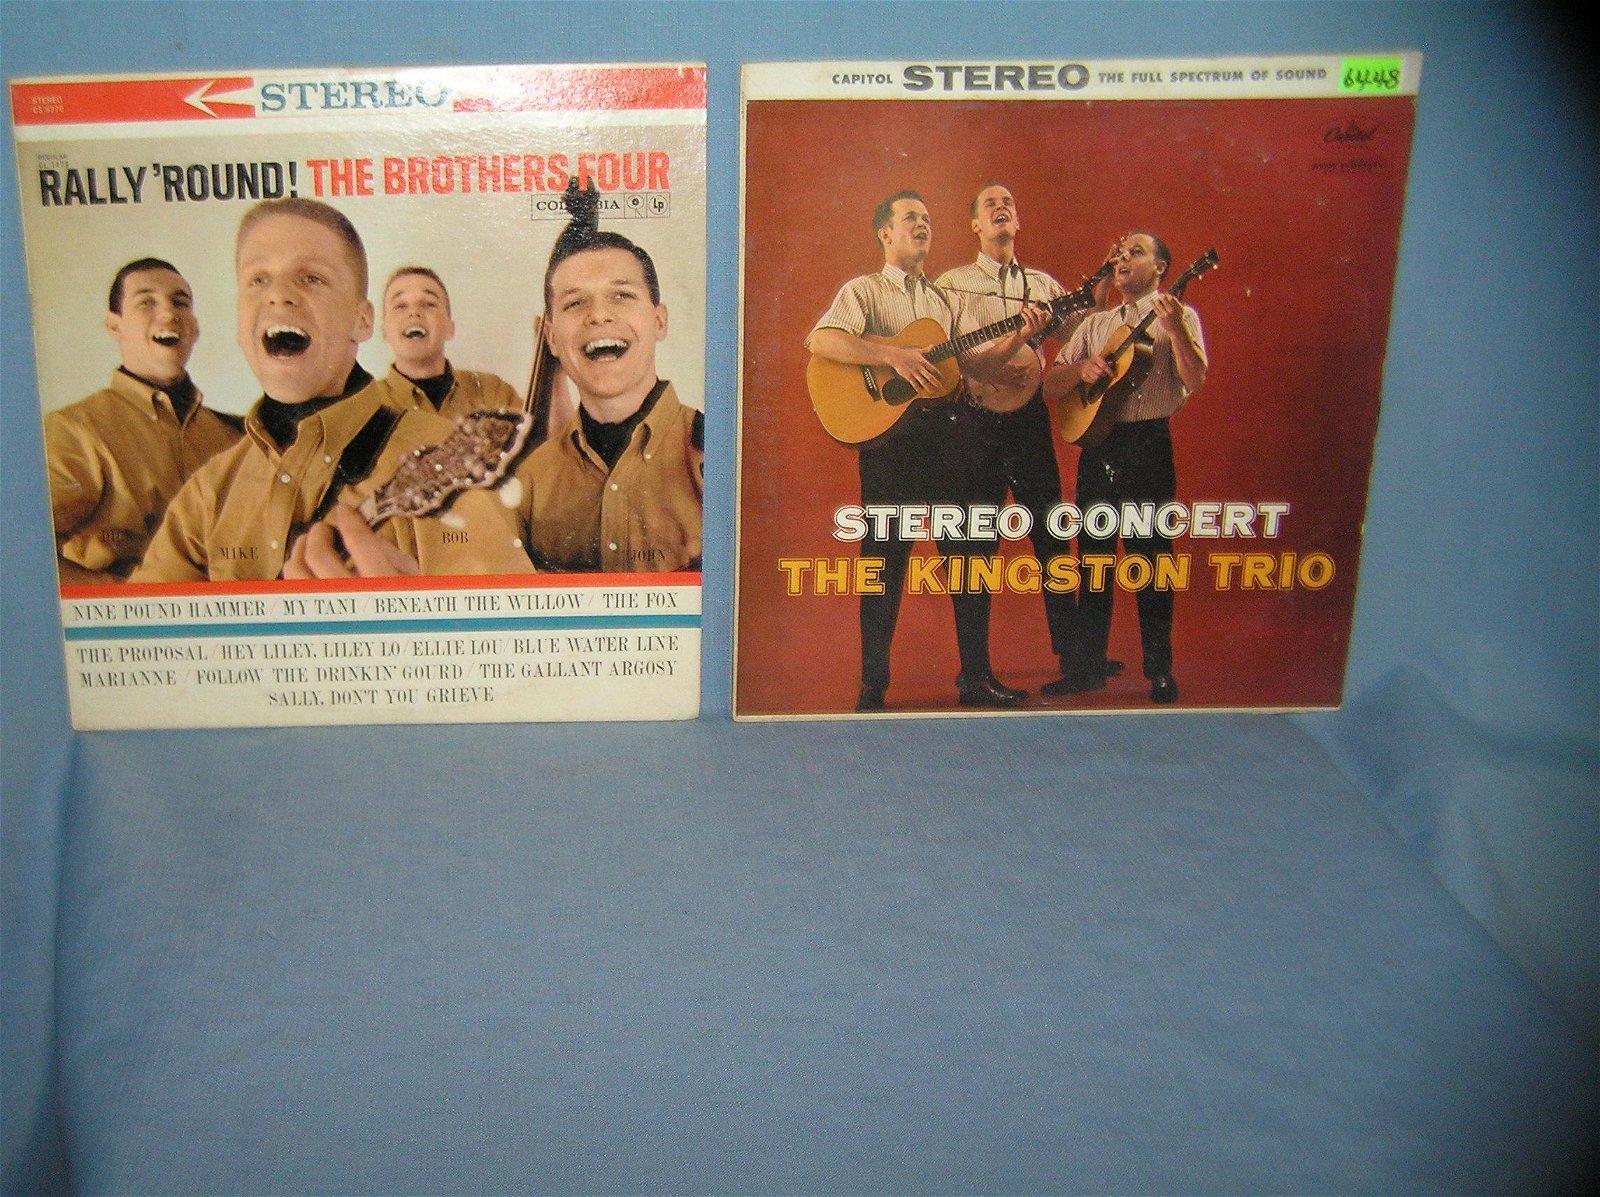 Pair of vintage record albums